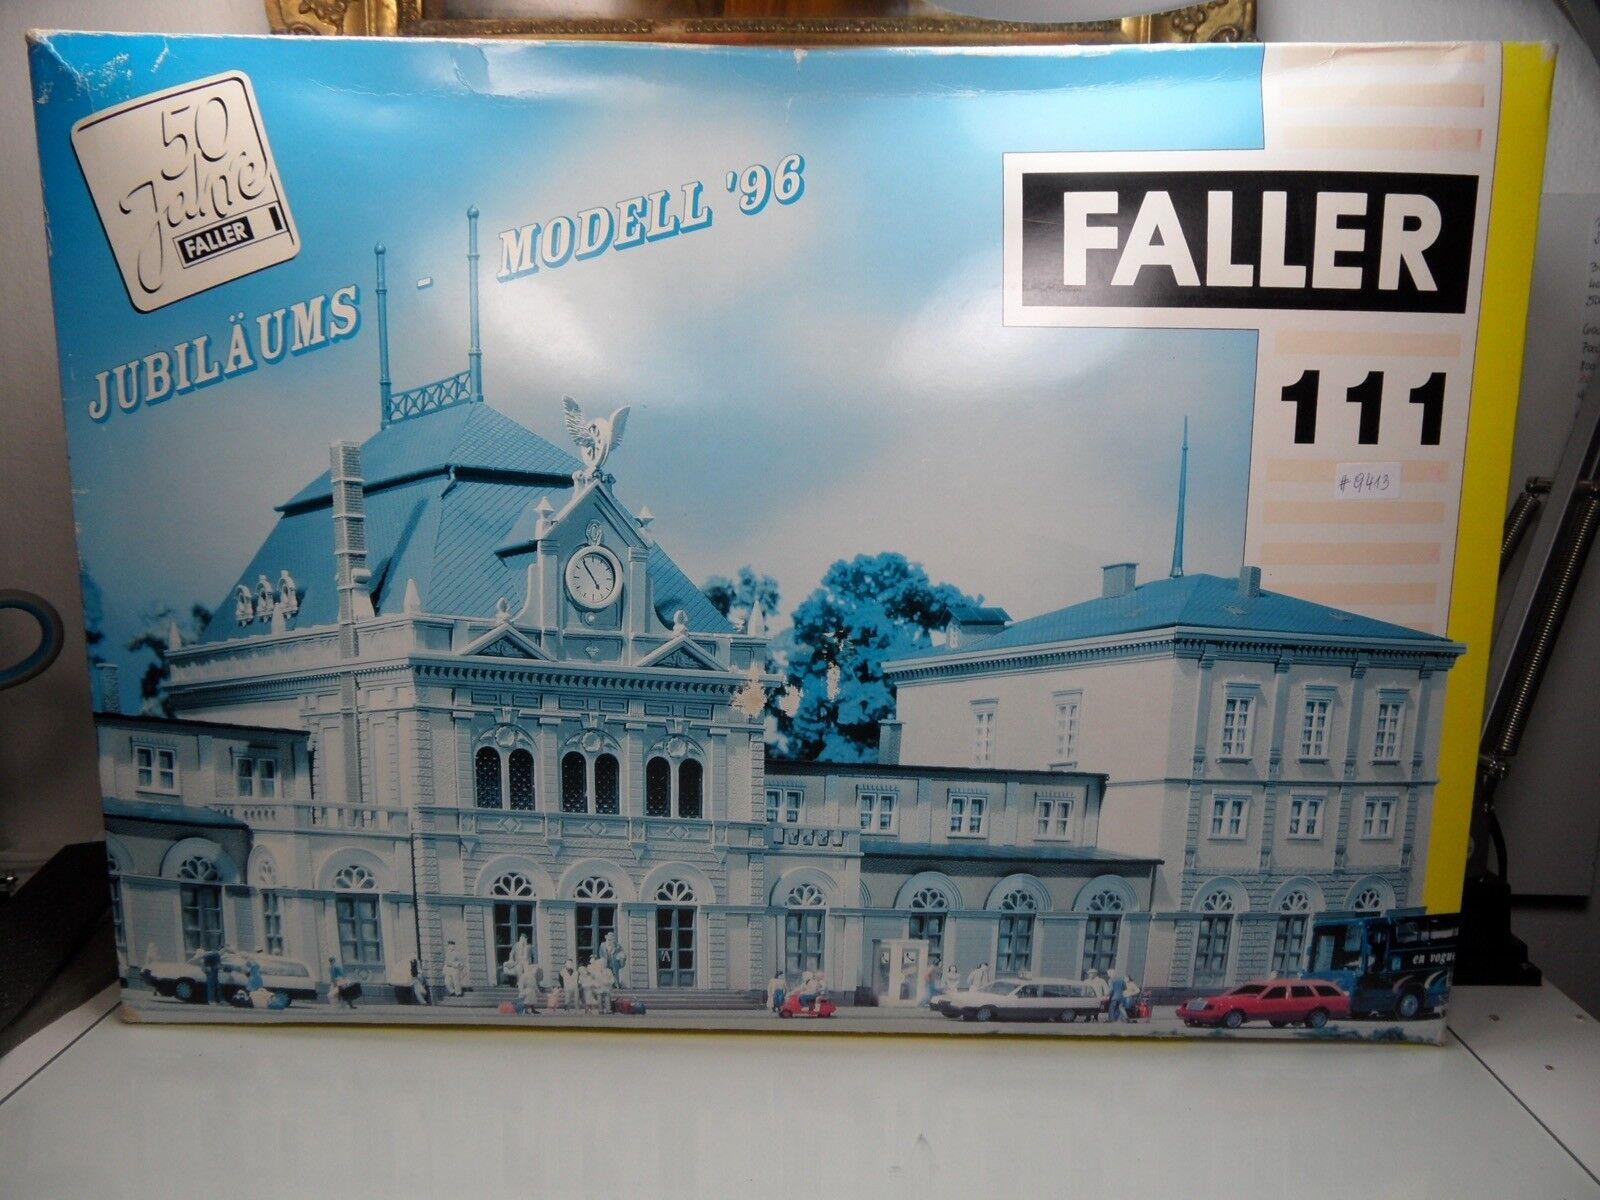 Faller 111 - H0 - Bahnhof - NEUSTADT - Weinstraße - TOP in OVP -  9413